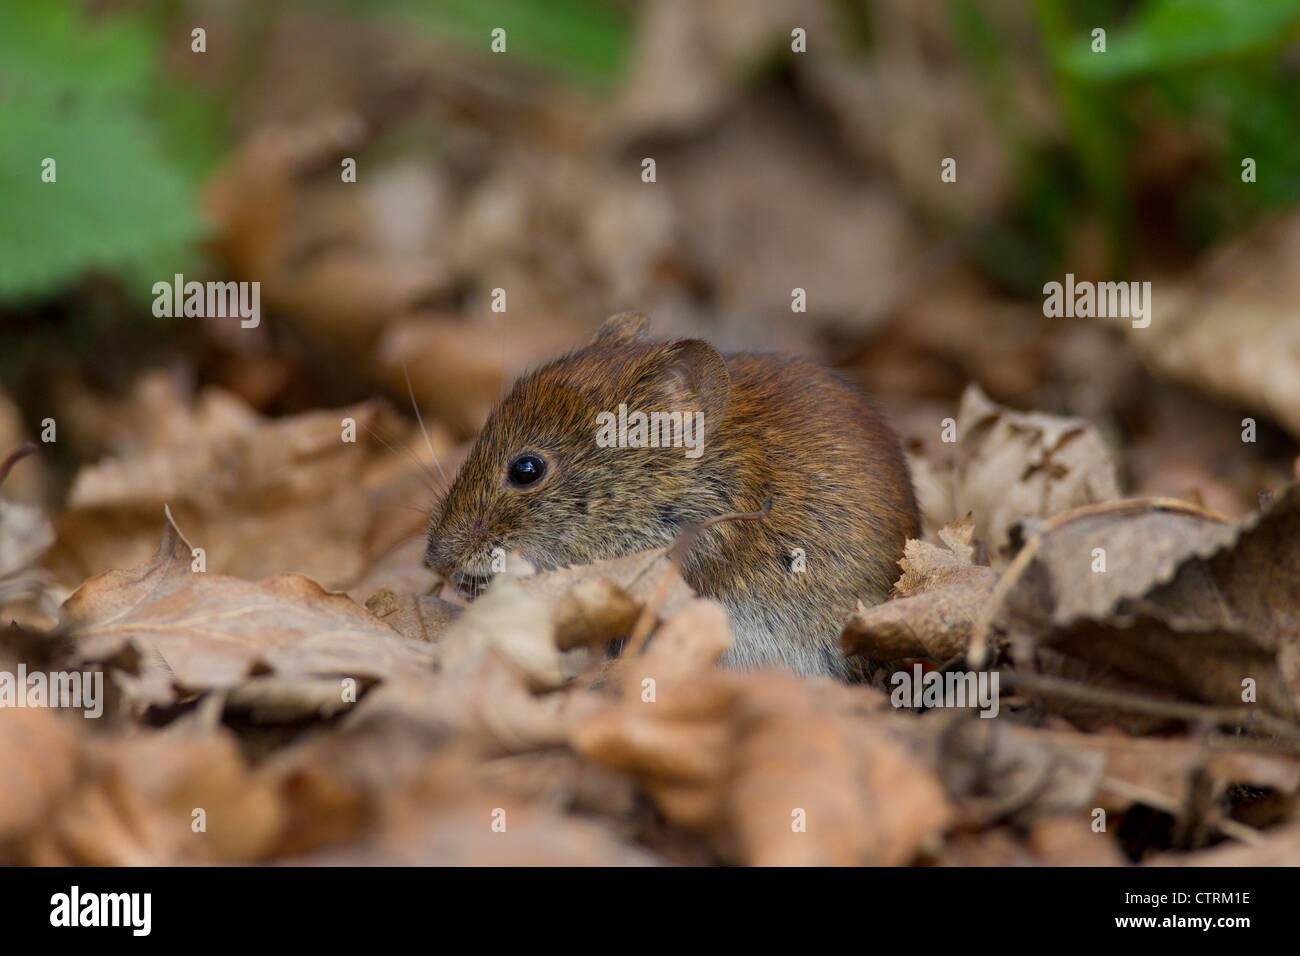 Bank vole (Myodes glareolus / Clethrionomys glareolus) foraging among autumn leaves on the forest floor, Germany - Stock Image